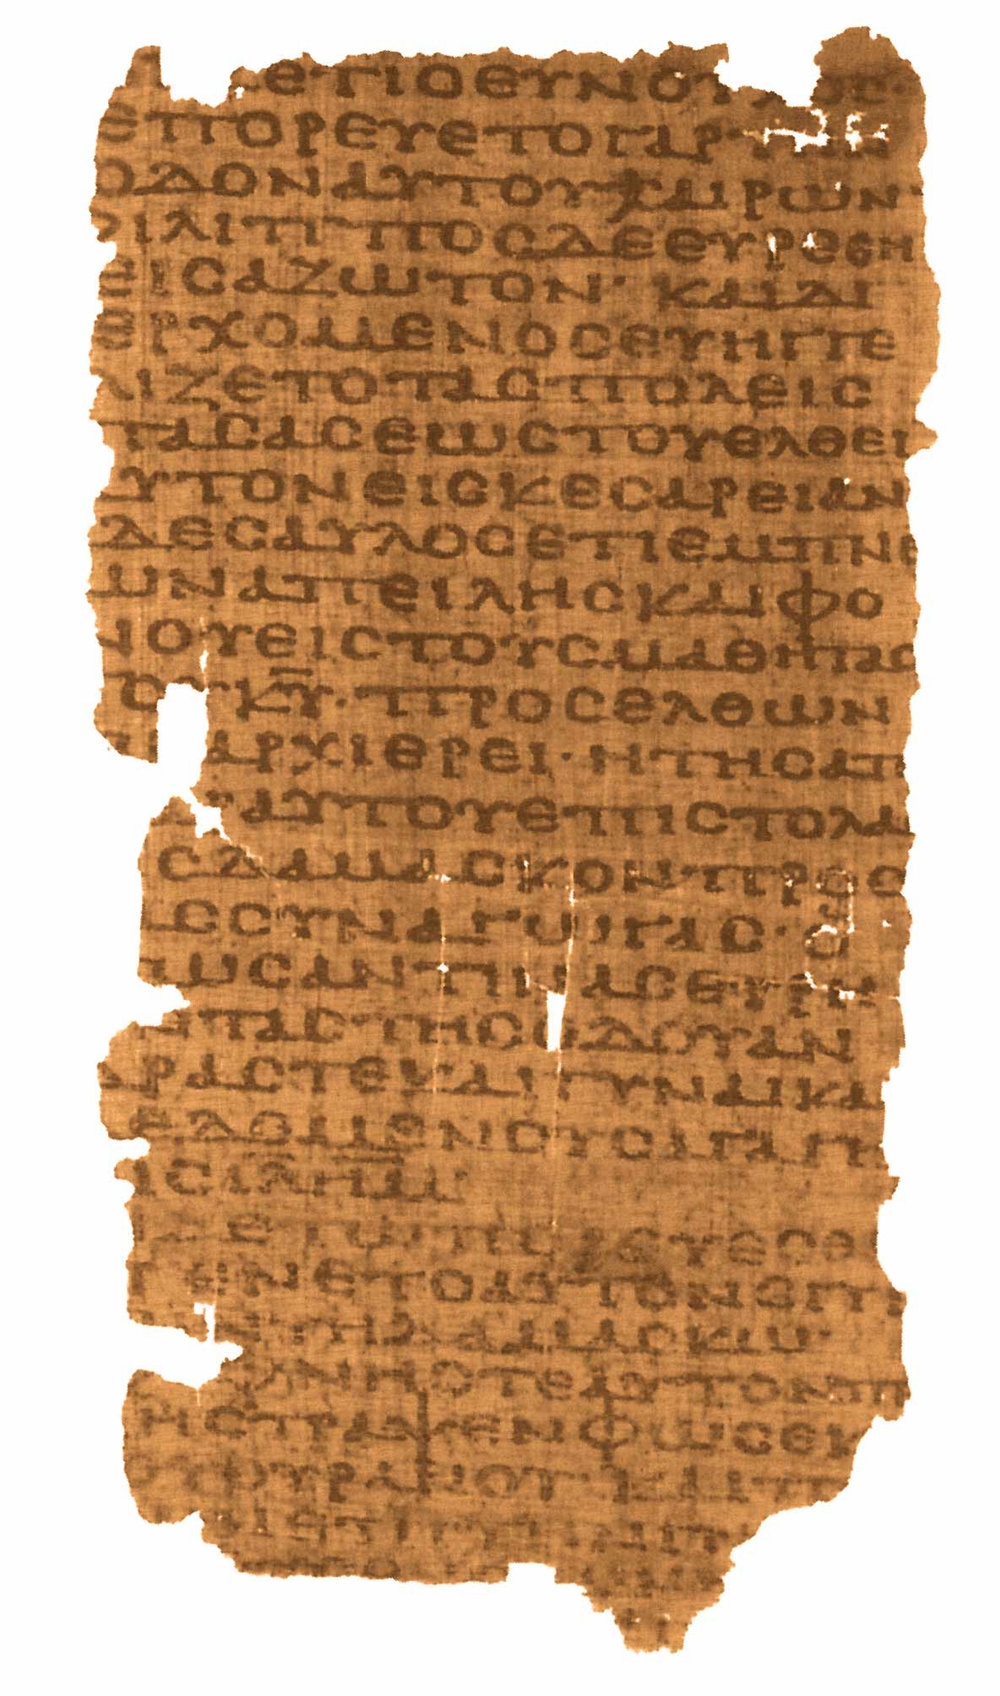 - Papyrus 74